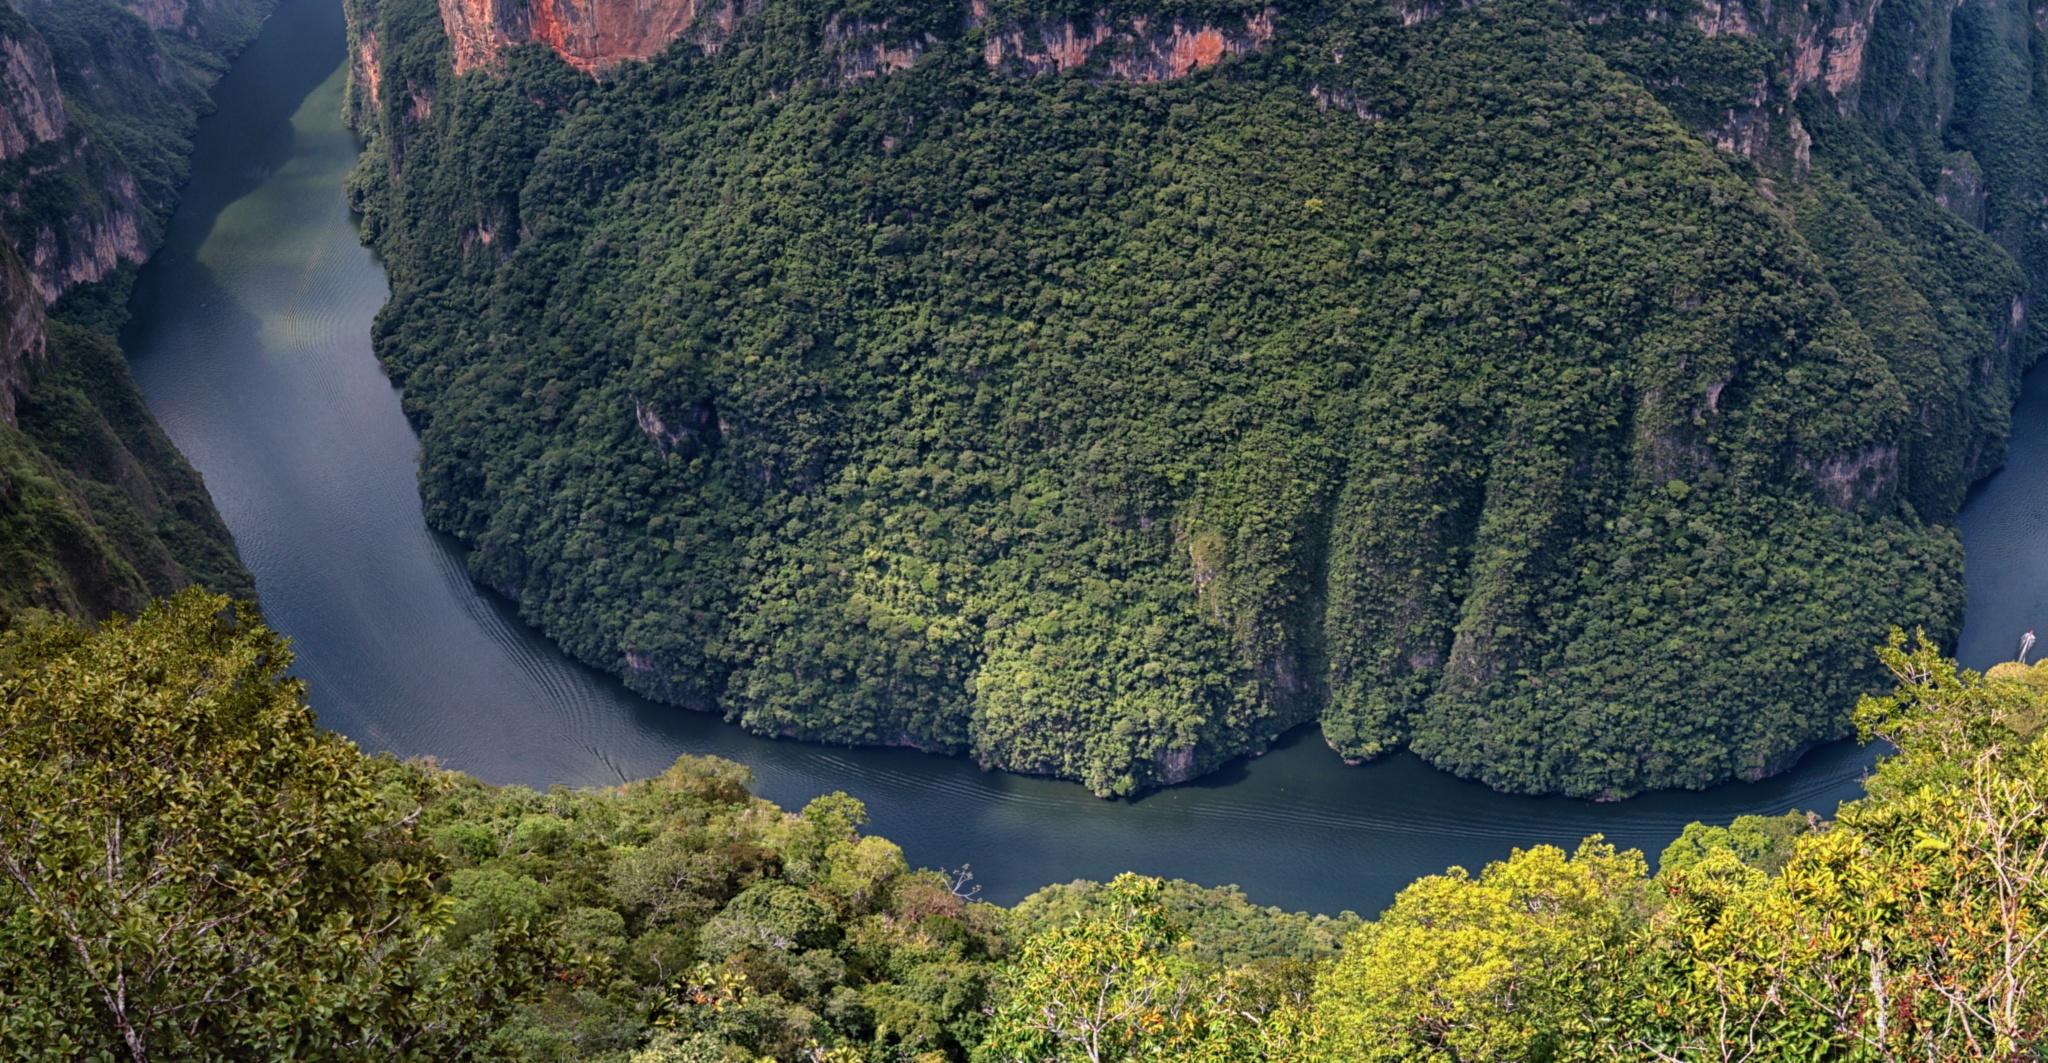 Sumidero Canyon  by Michele Marrucci